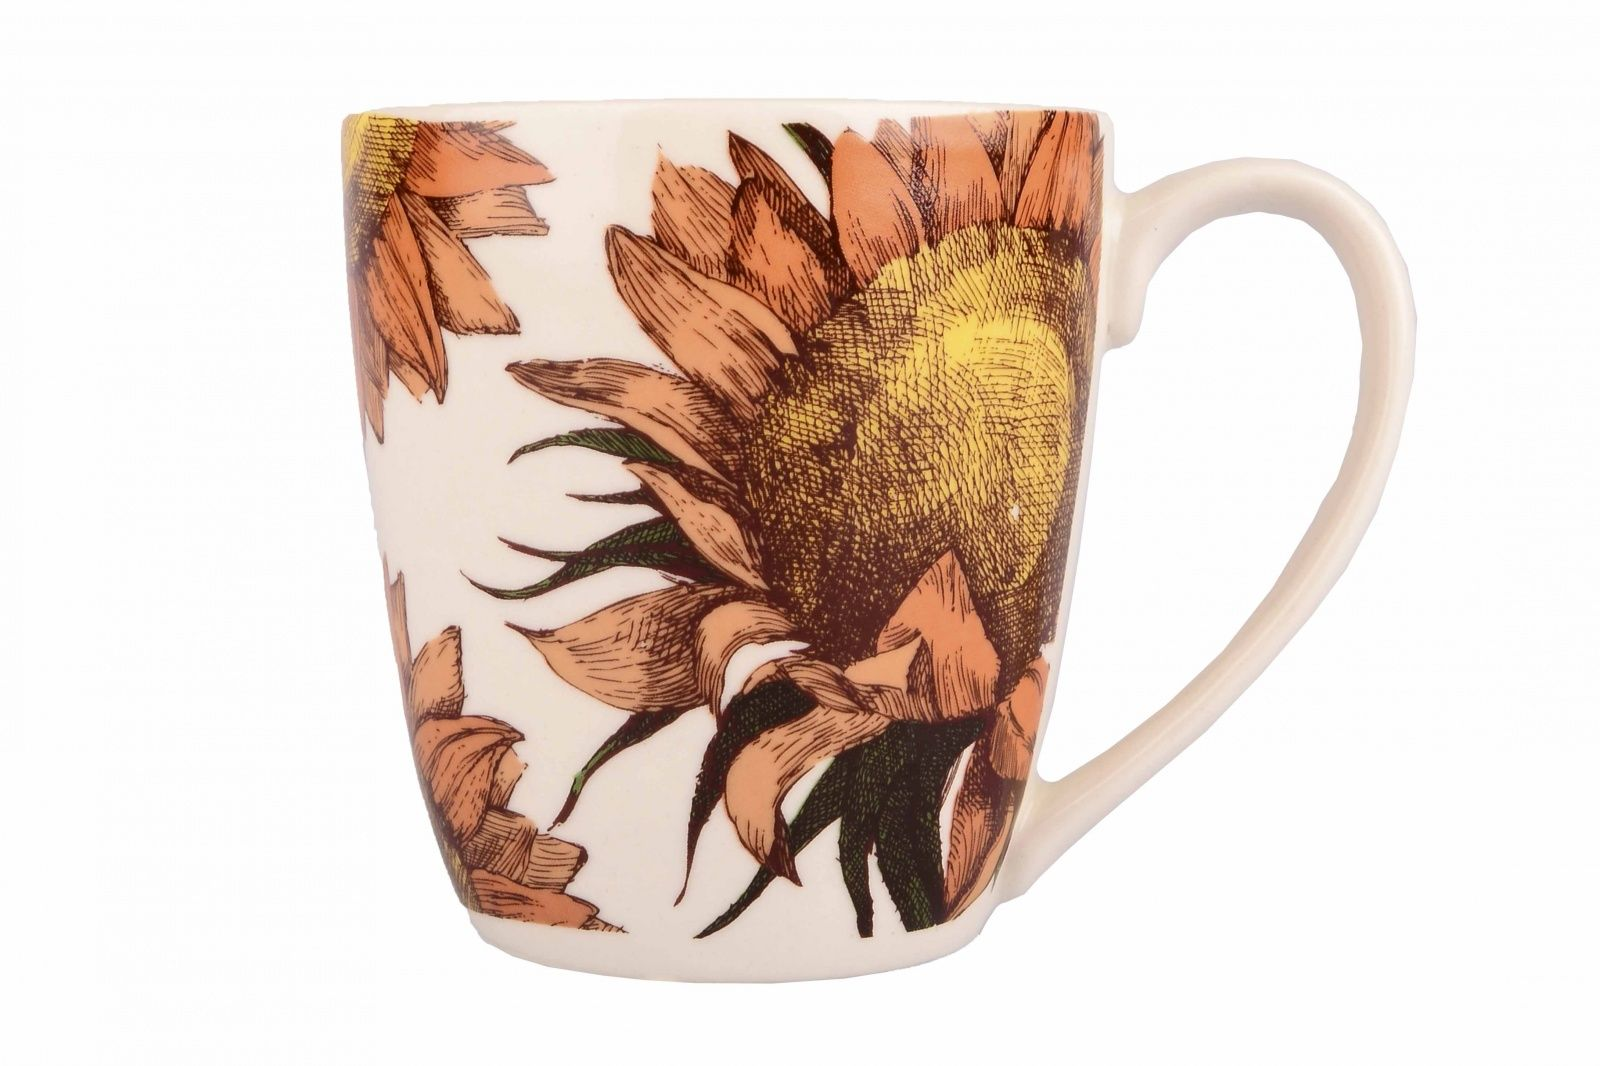 Dulevo porcelain / Mug 400 ml Saturn Sunflowers (Ceramics)